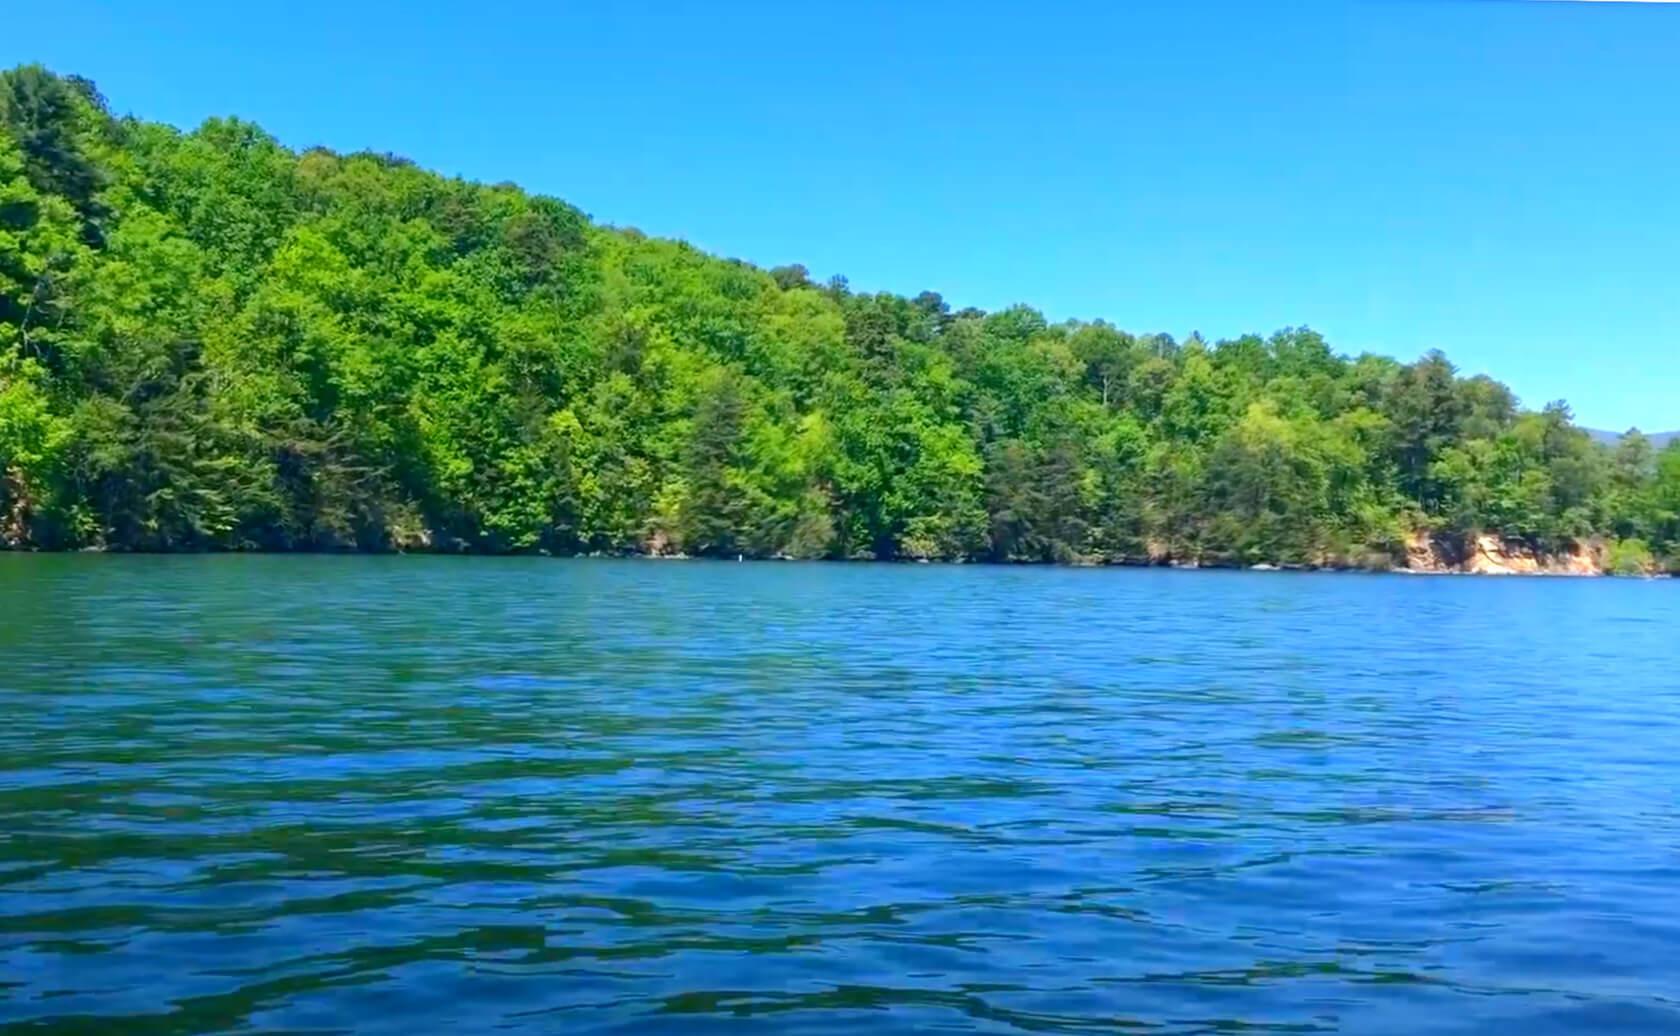 Jocassee-Lake-Fishing-Guide-Report-South-Carolina-05